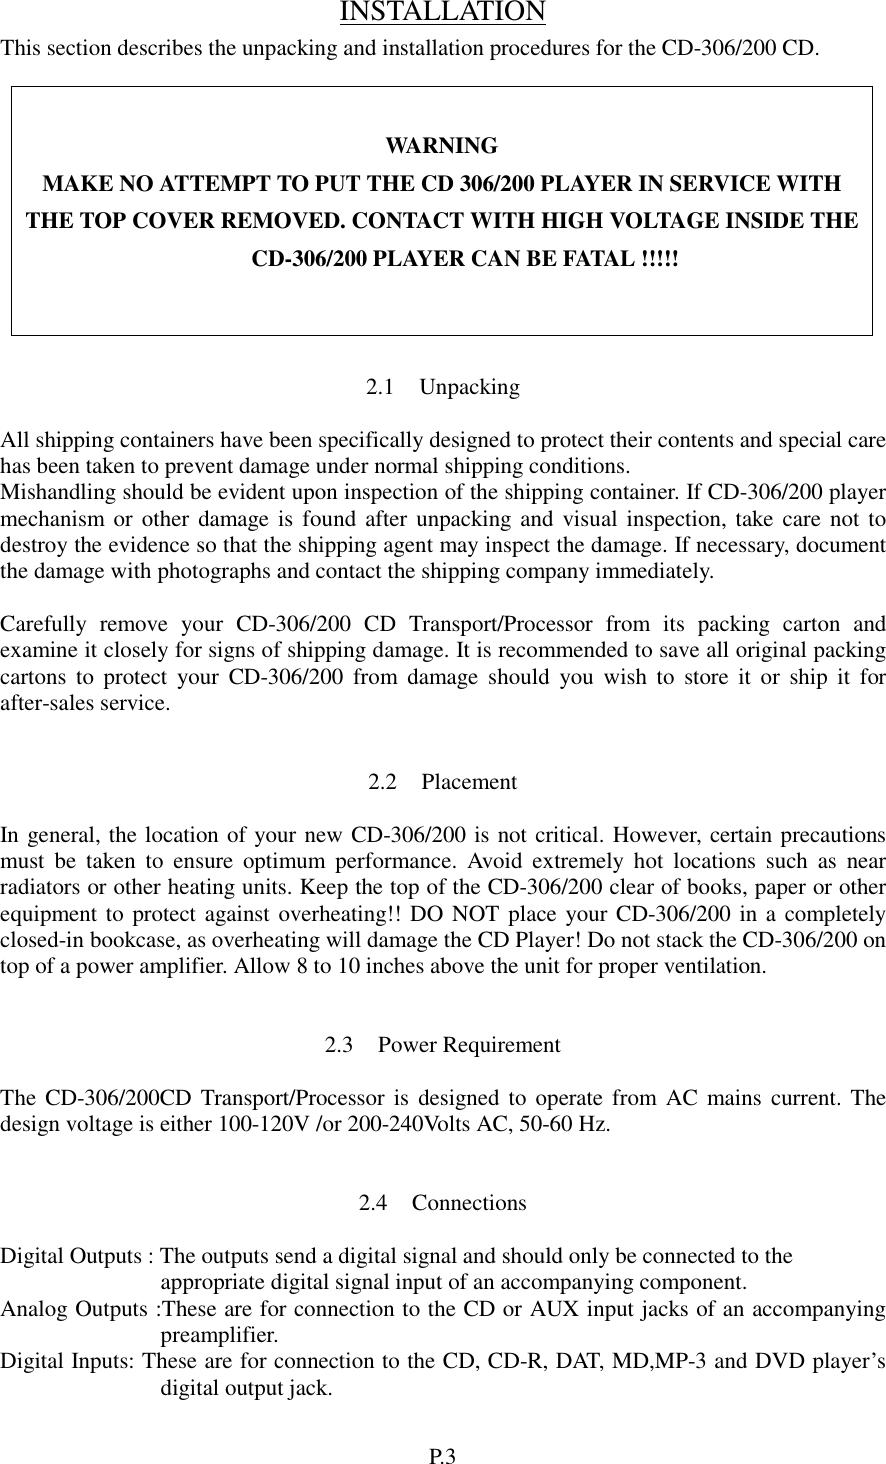 Cary Audio Design Cd Users Manual Operating - Audio design document